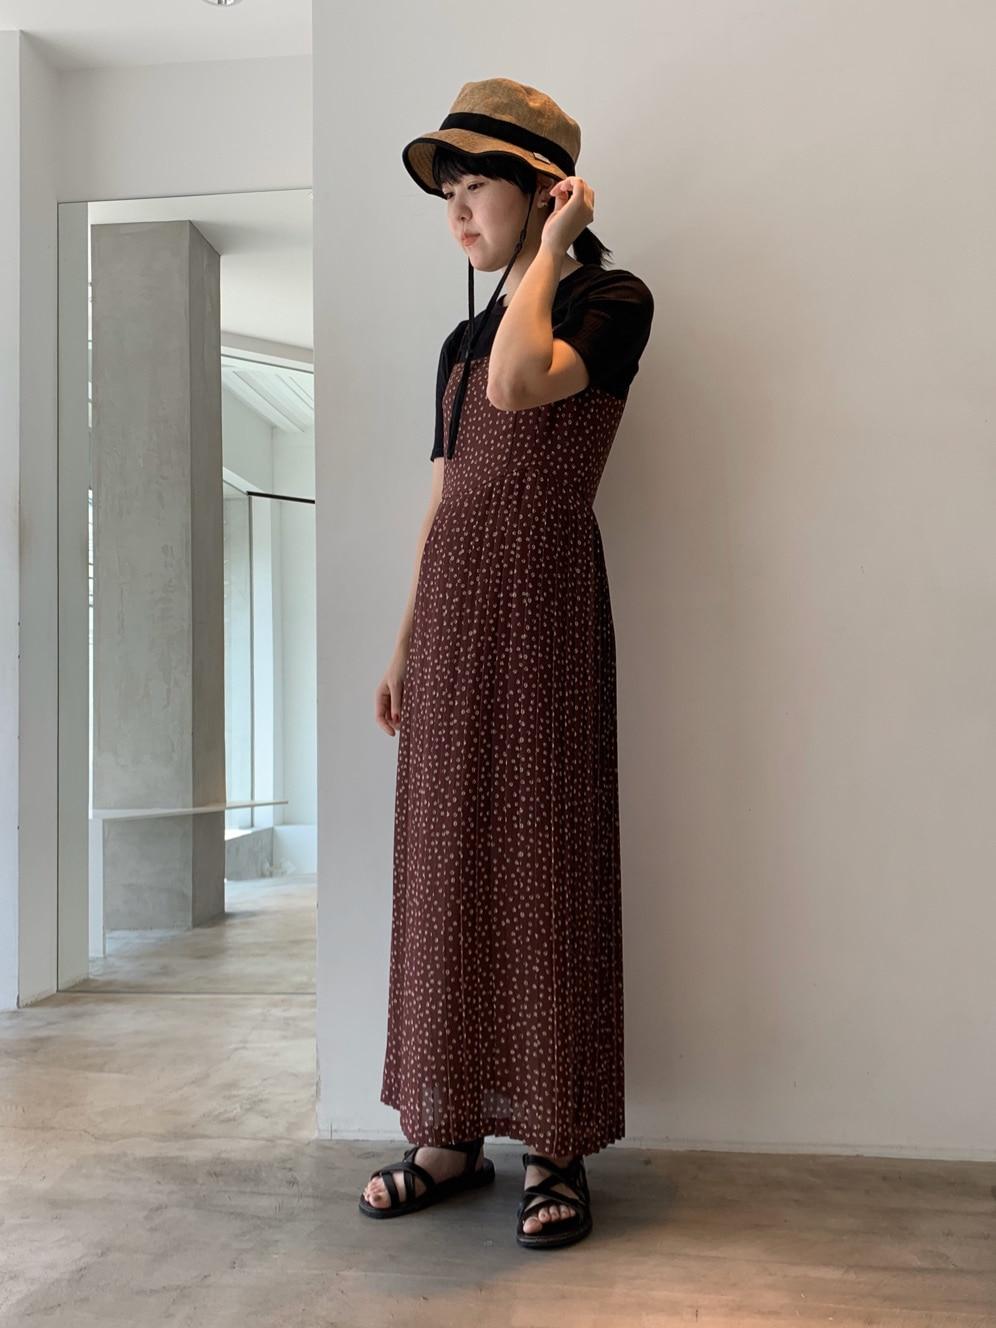 note et silence. ルミネ新宿 身長:160cm 2020.08.26